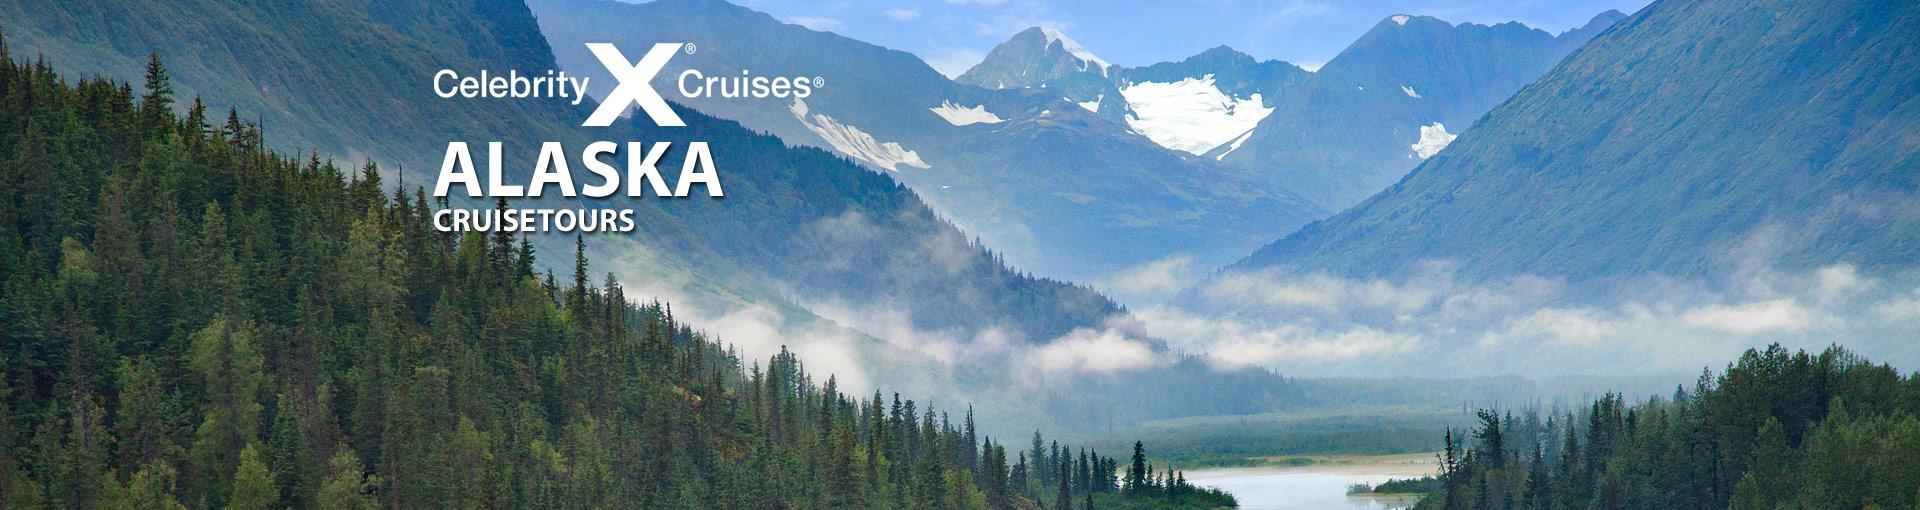 Celebrity Alaska Cruisetours